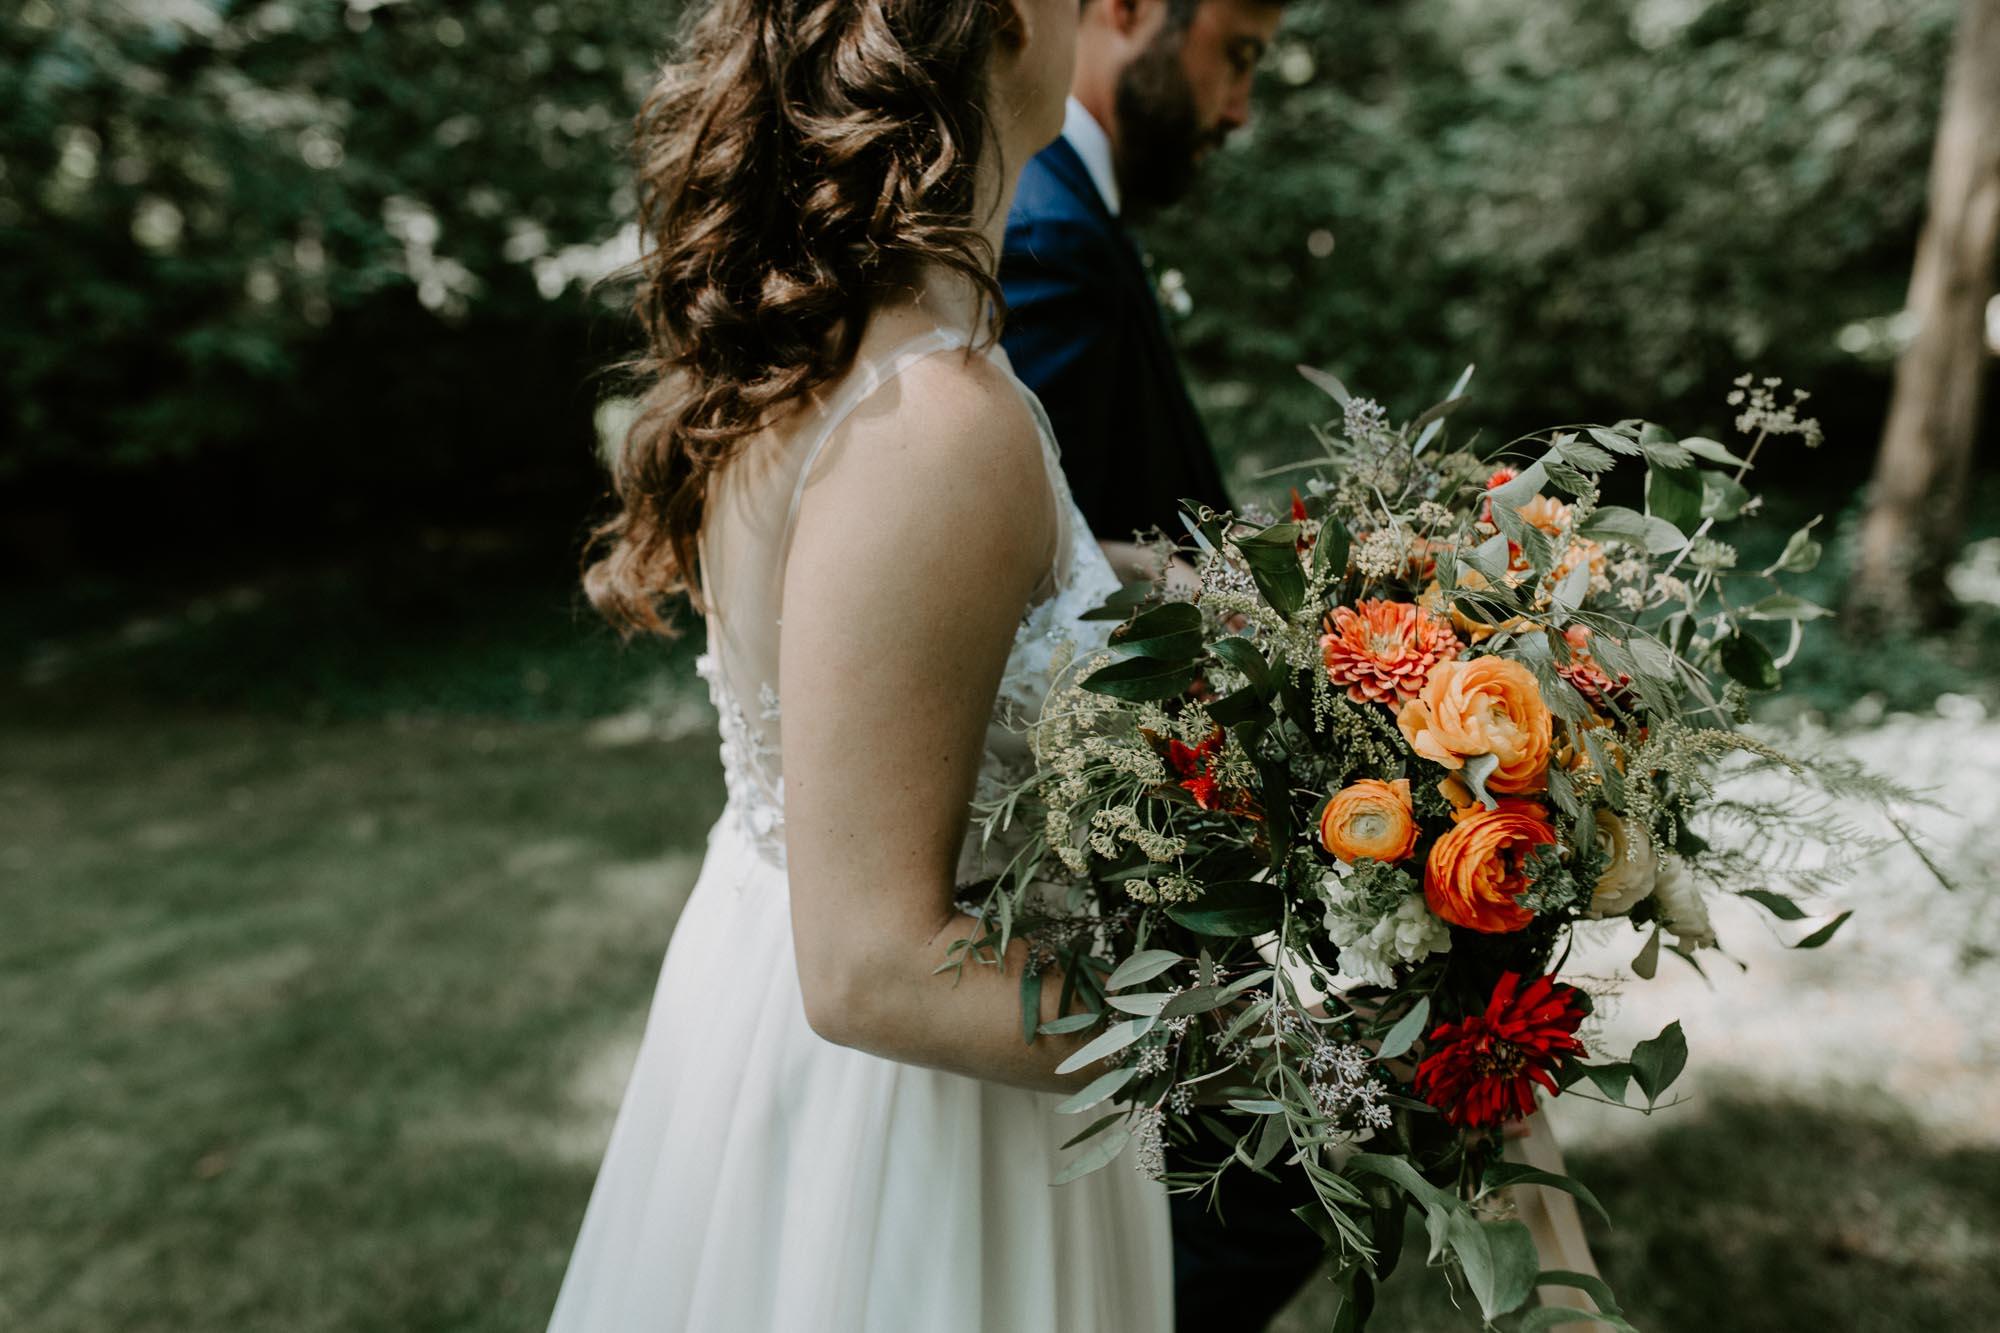 journeyman_distillery_wedding_photographer_chicago_il_wright_photographs-2450.jpg